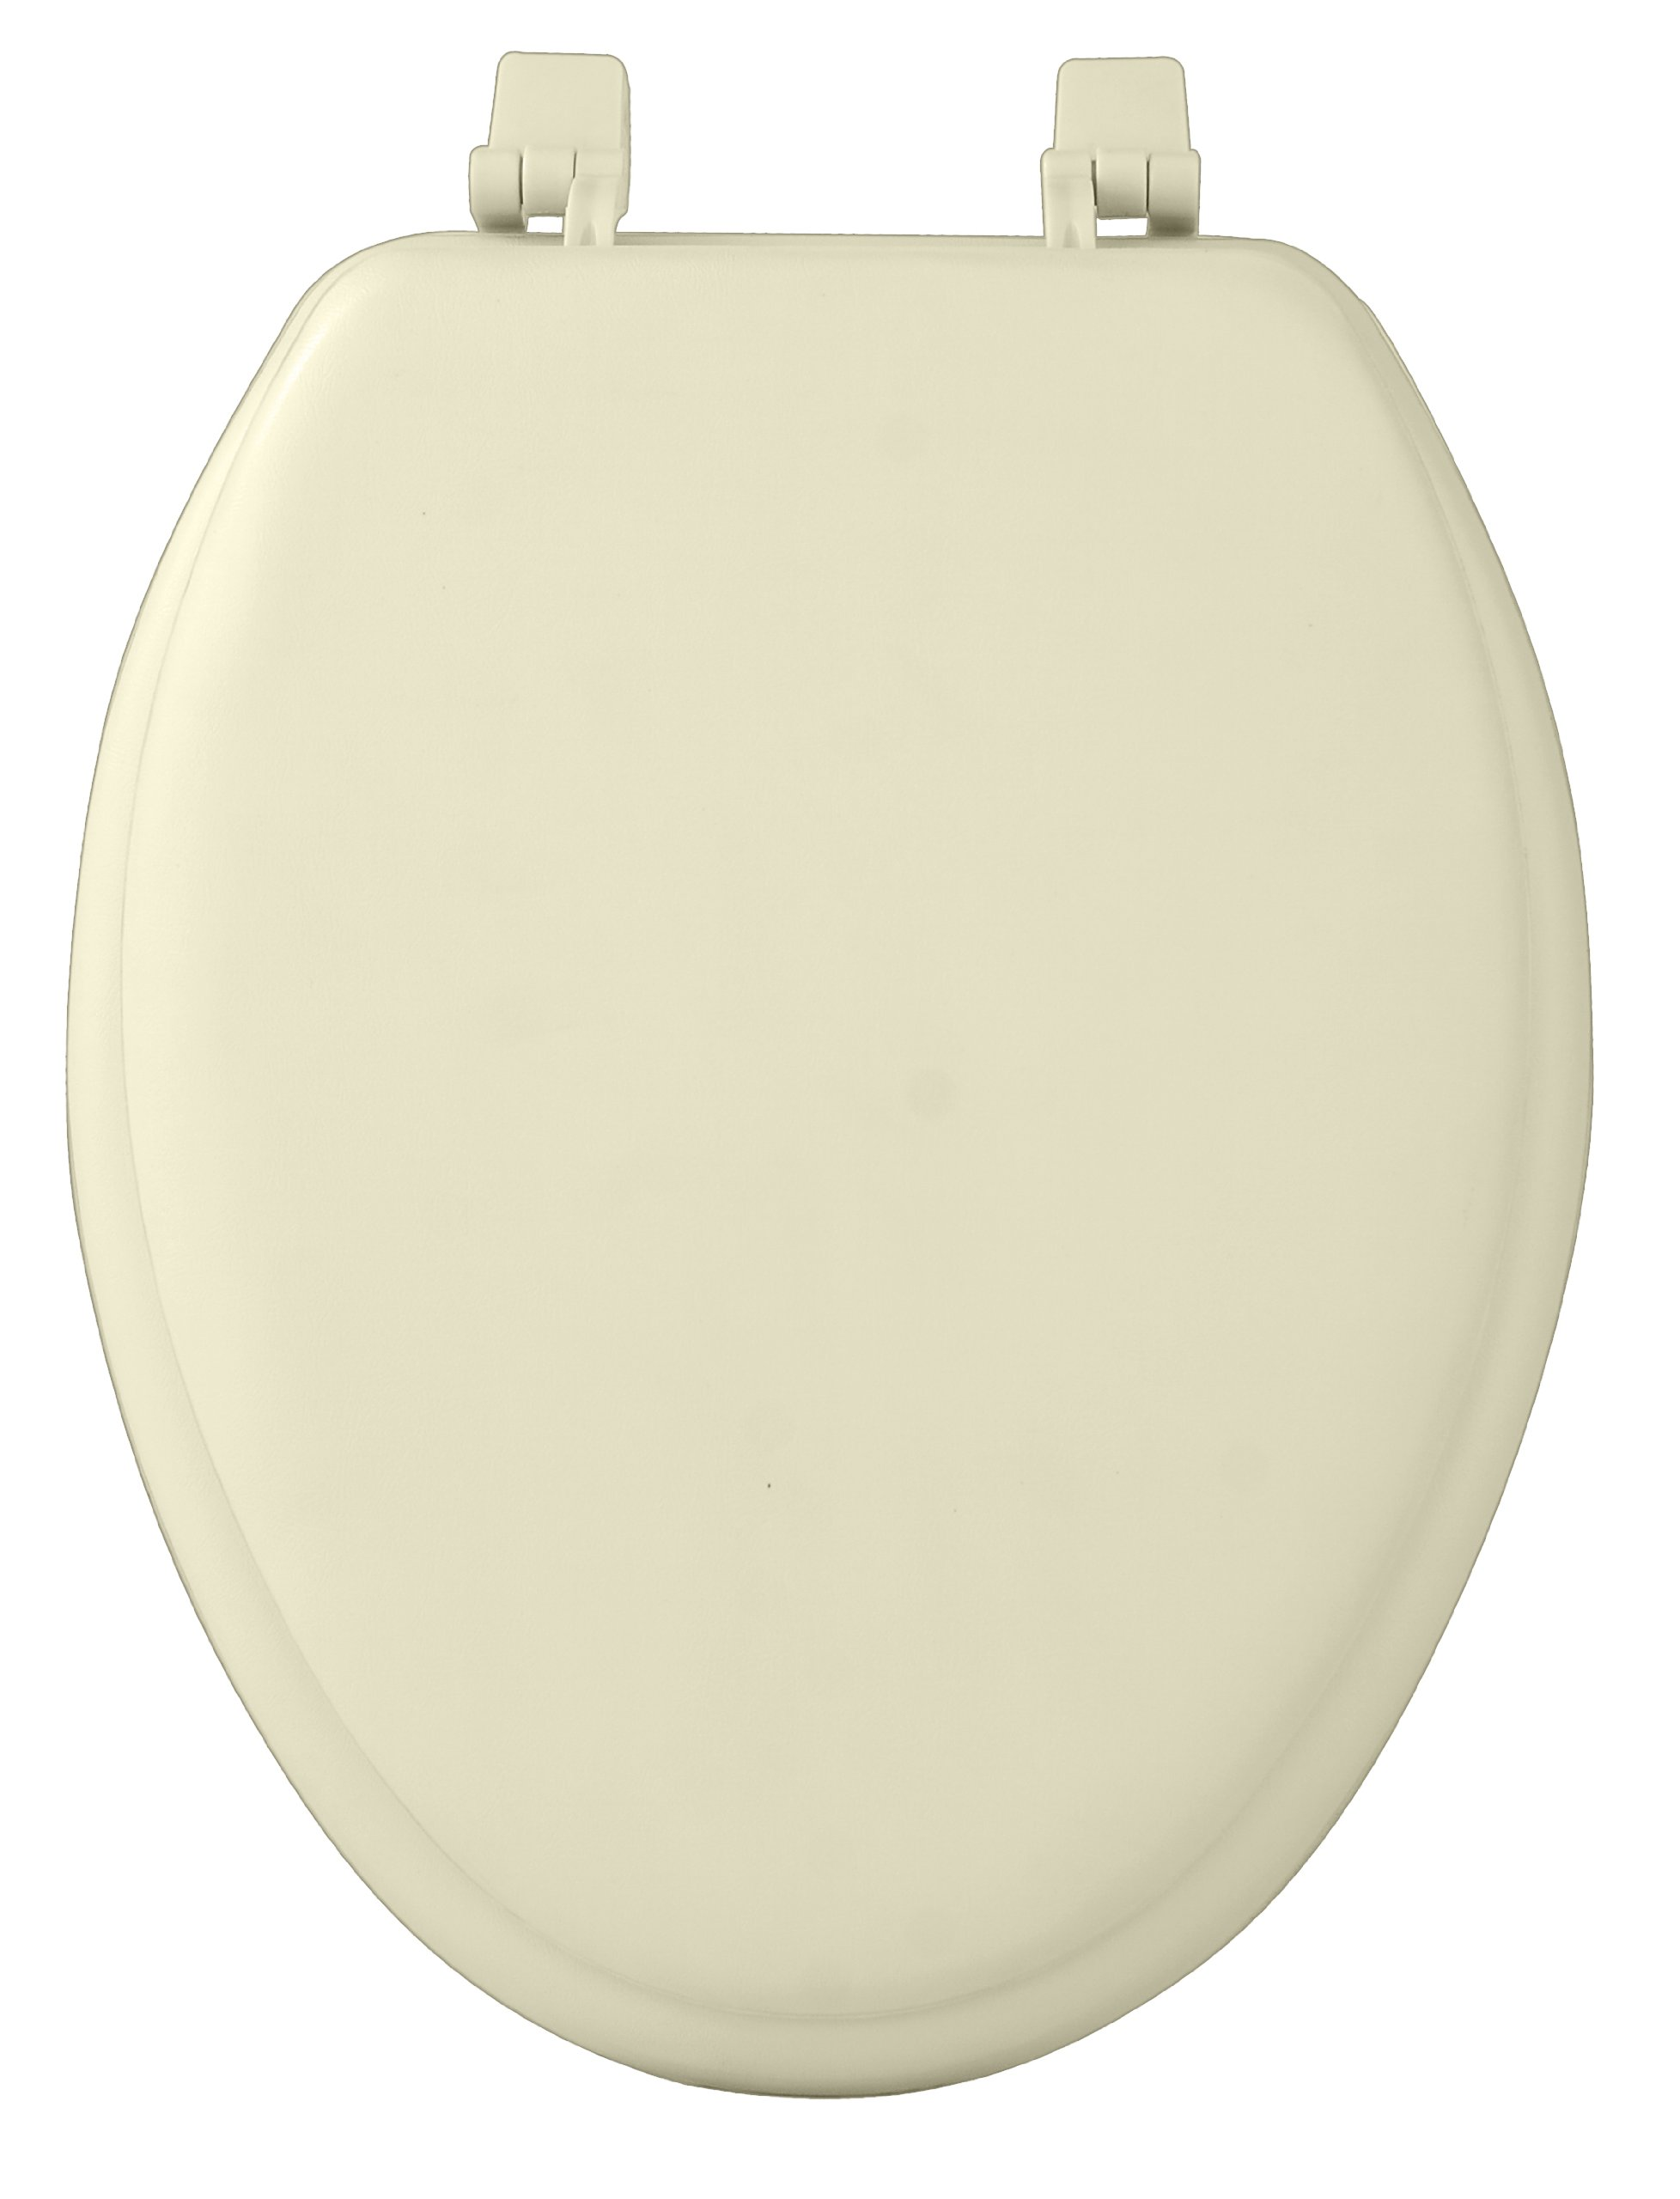 Achim Home Furnishings TOVYELBN04 19-Inch Fantasia Elongated Toilet Seat, Soft Bone